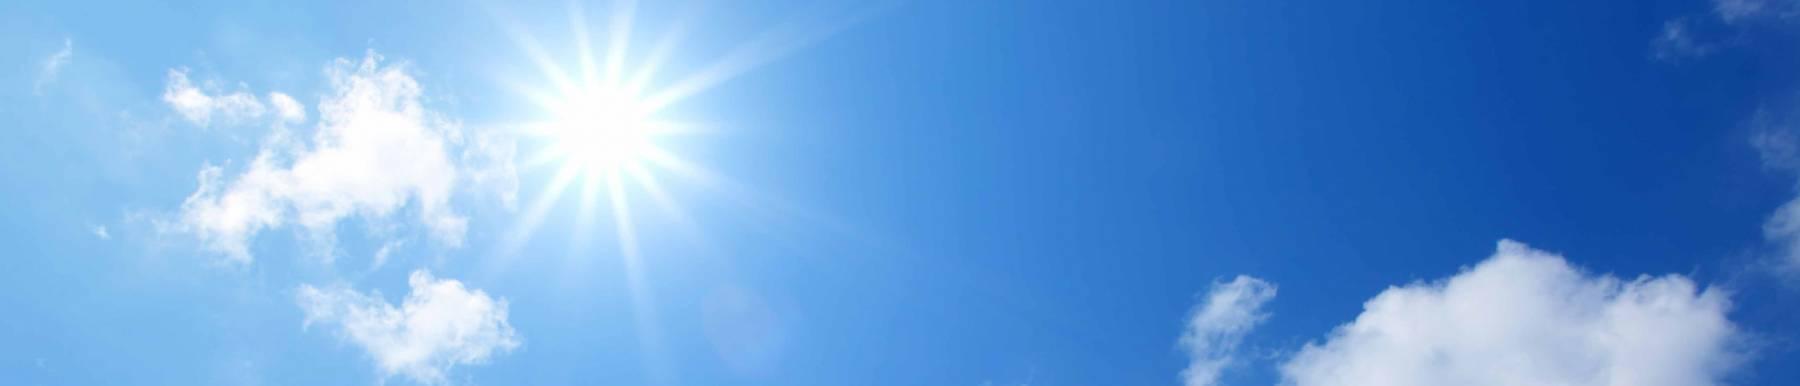 Bluebird skies with a bright sun